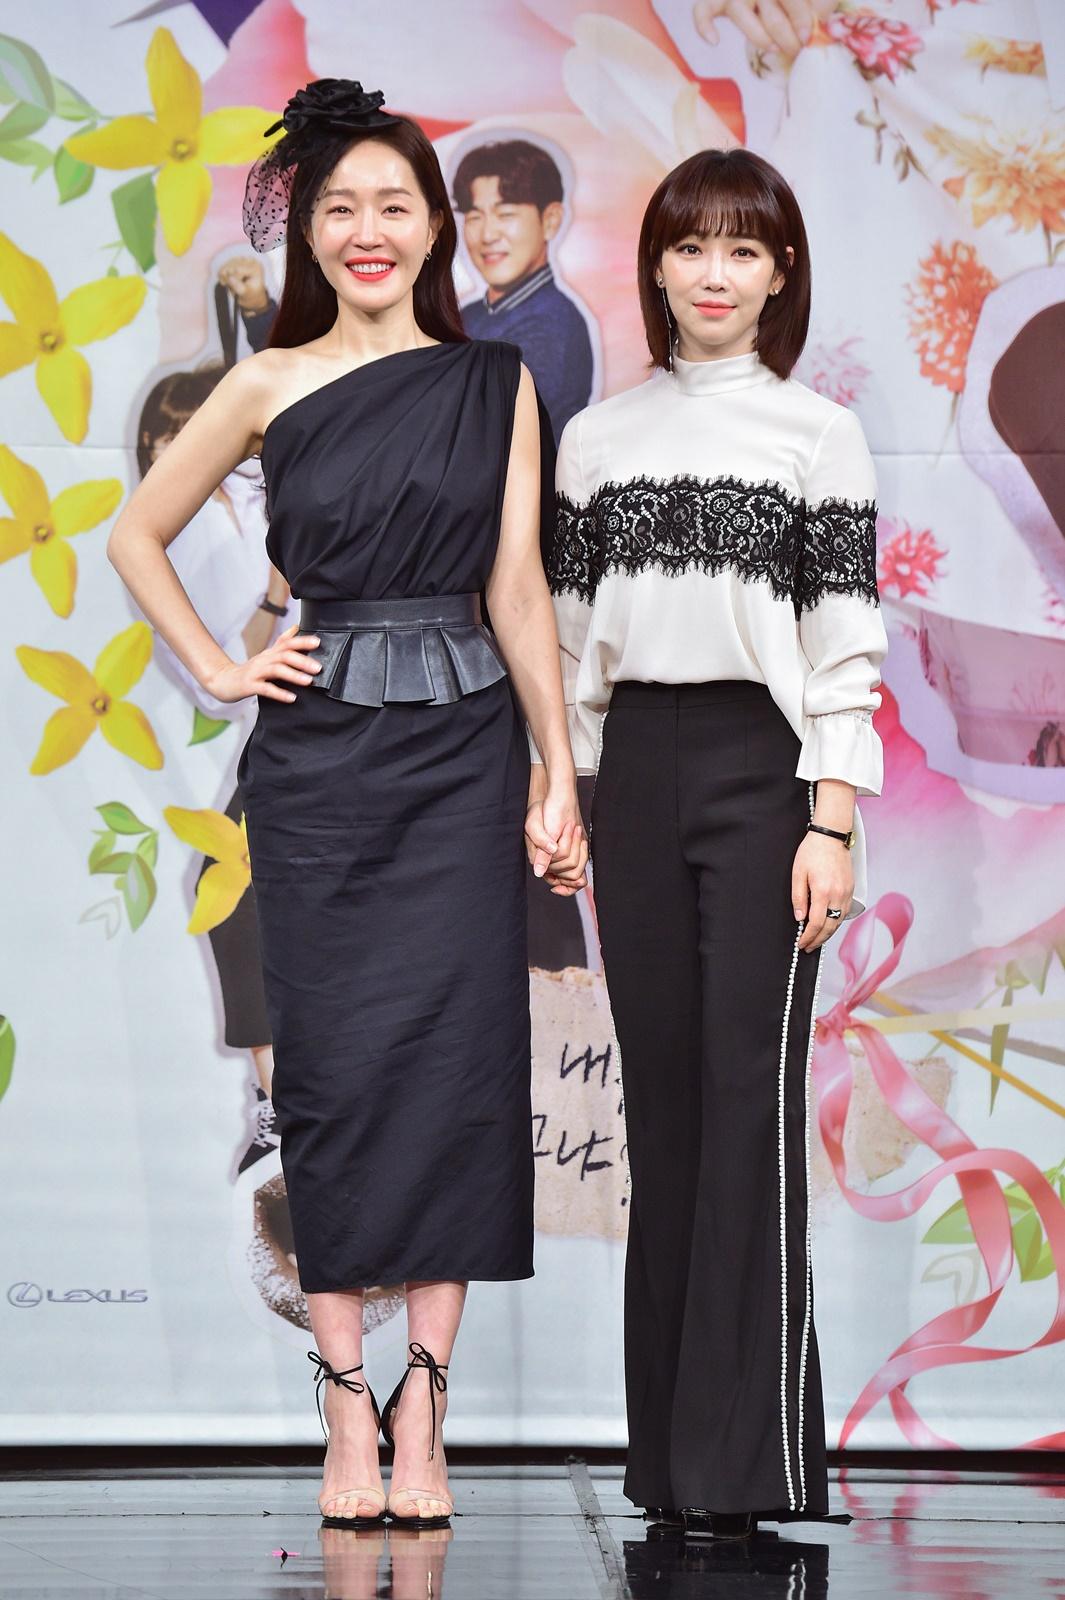 [TV톡] 이유리X엄지원의 2인 4역… 코믹함 입은 두 여자의 성장기 '봄이 오나 봄'